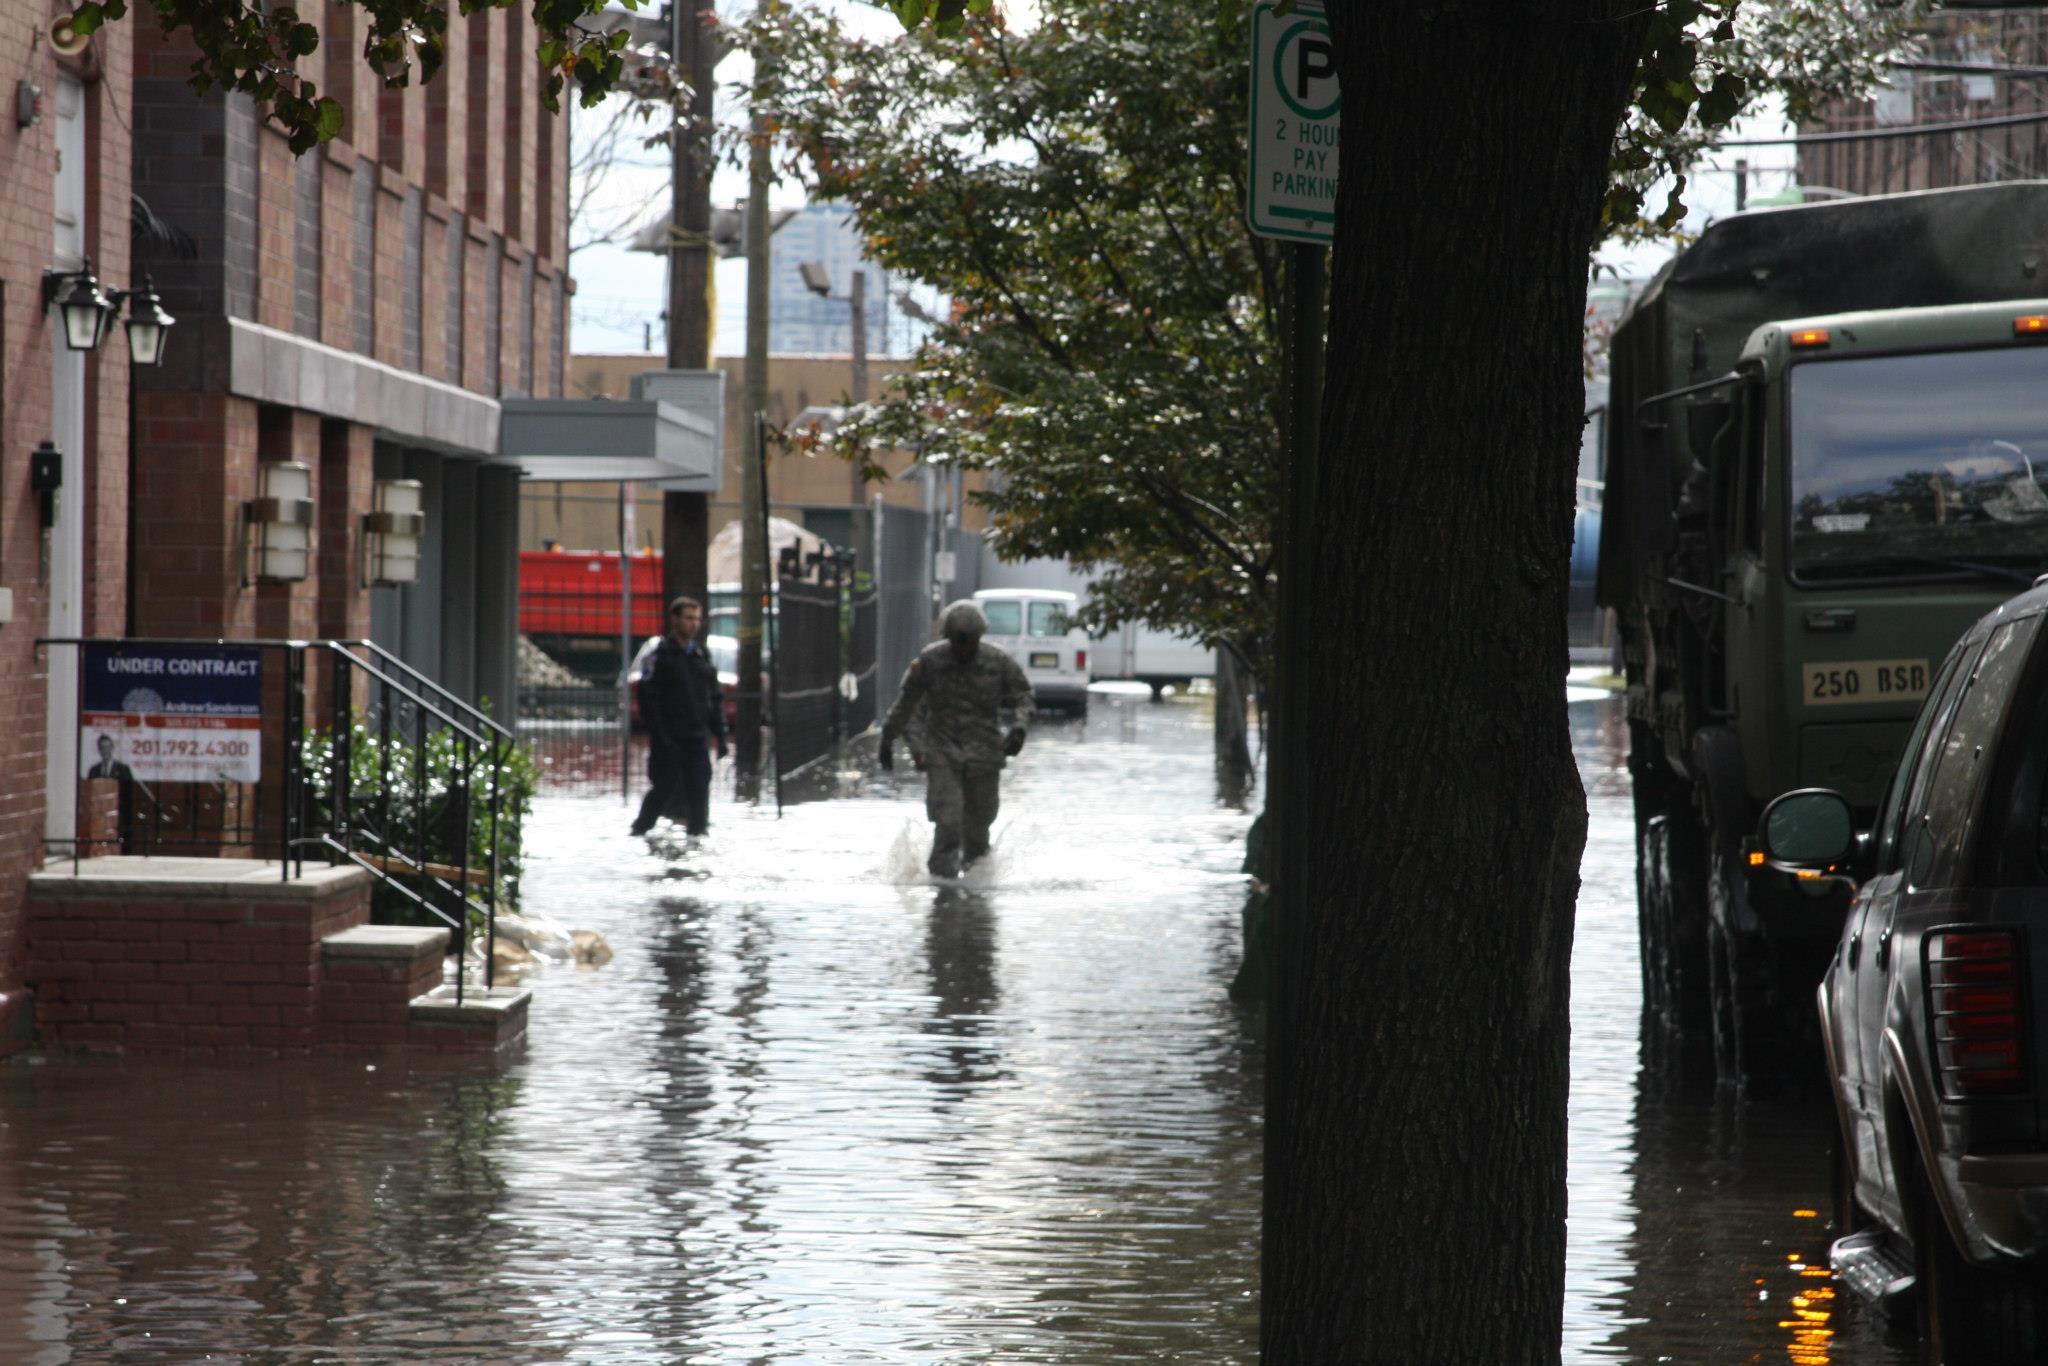 NJ_National_Guard_in_Hoboken_during_Hurricane_Sandy